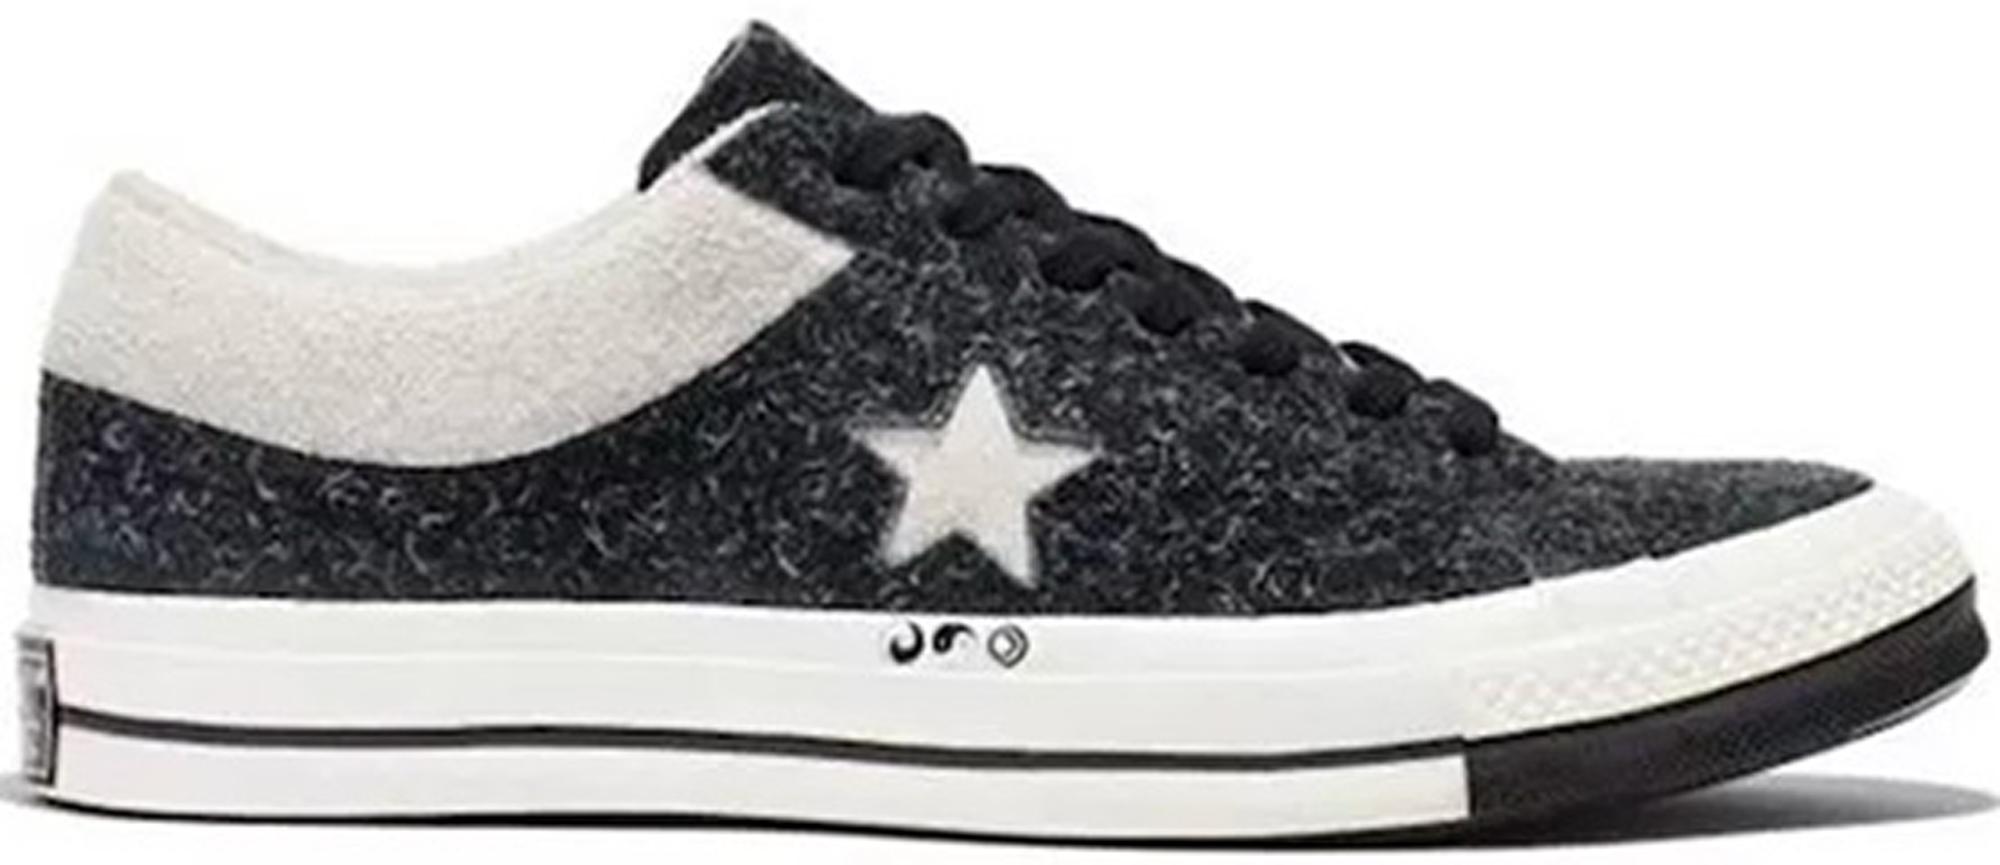 Converse One Star Ox Clot Black White